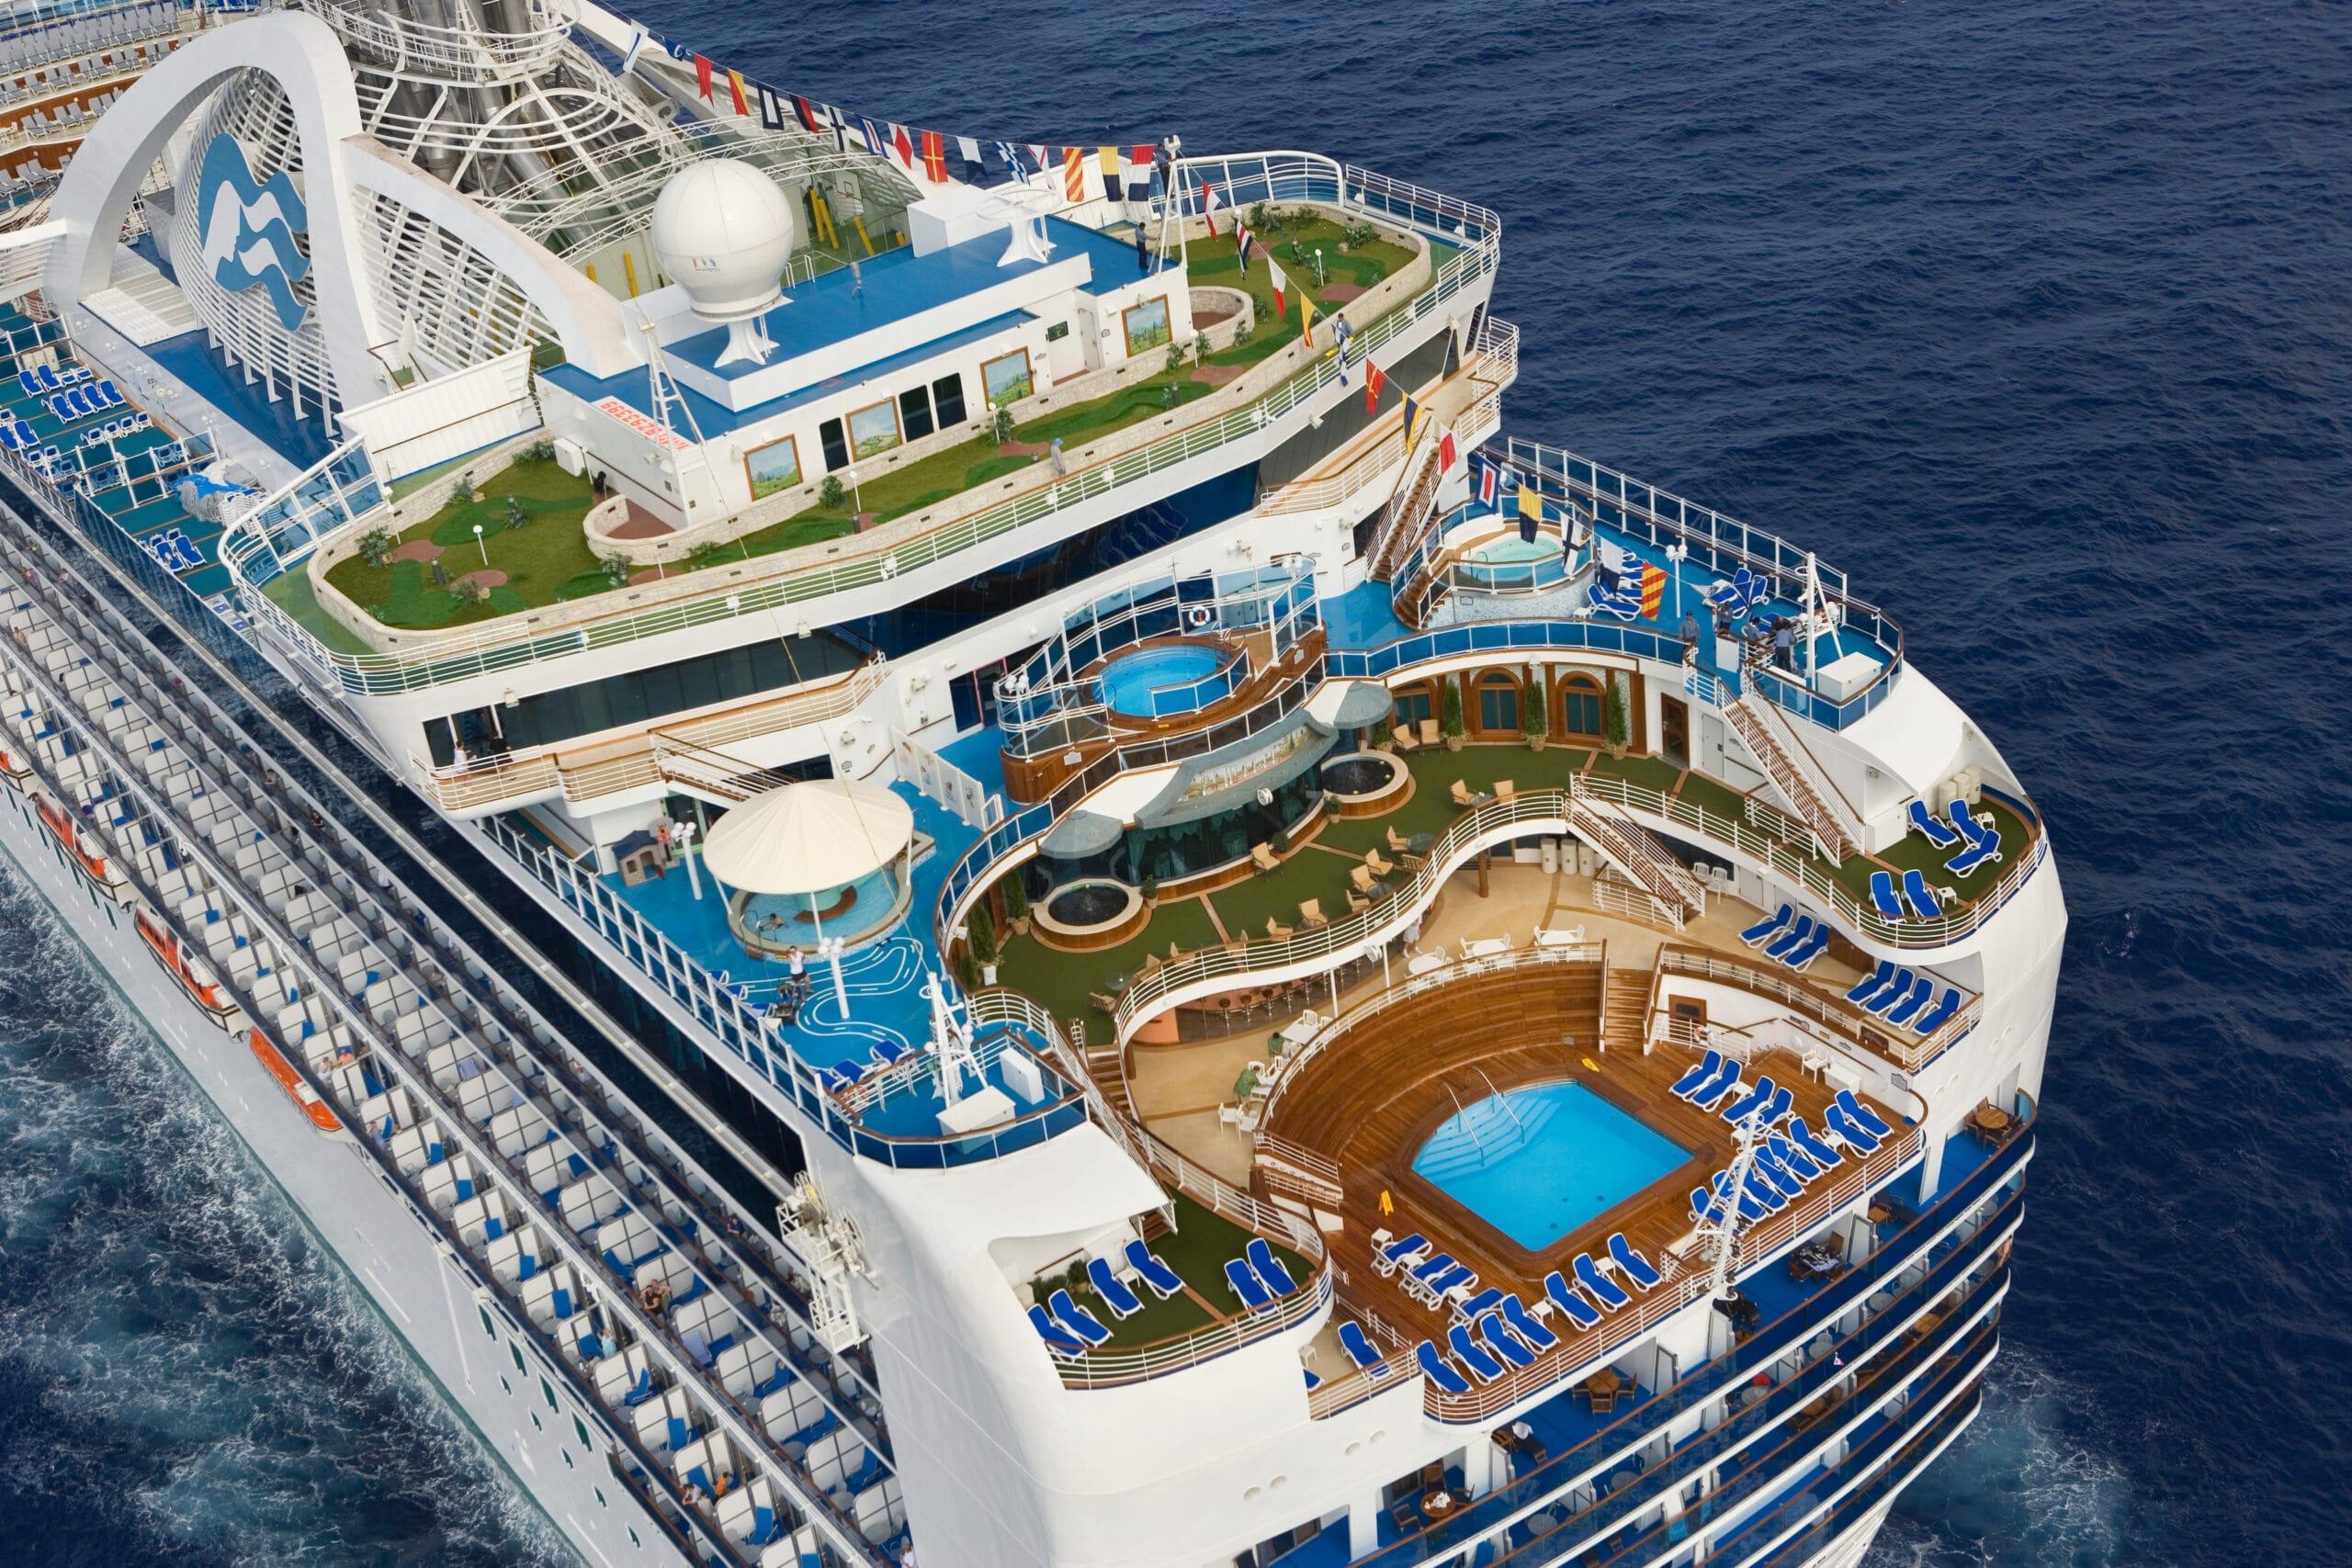 Cruiseschip-Crown Princess-Princess Cruises-Zwembad Achterdeck